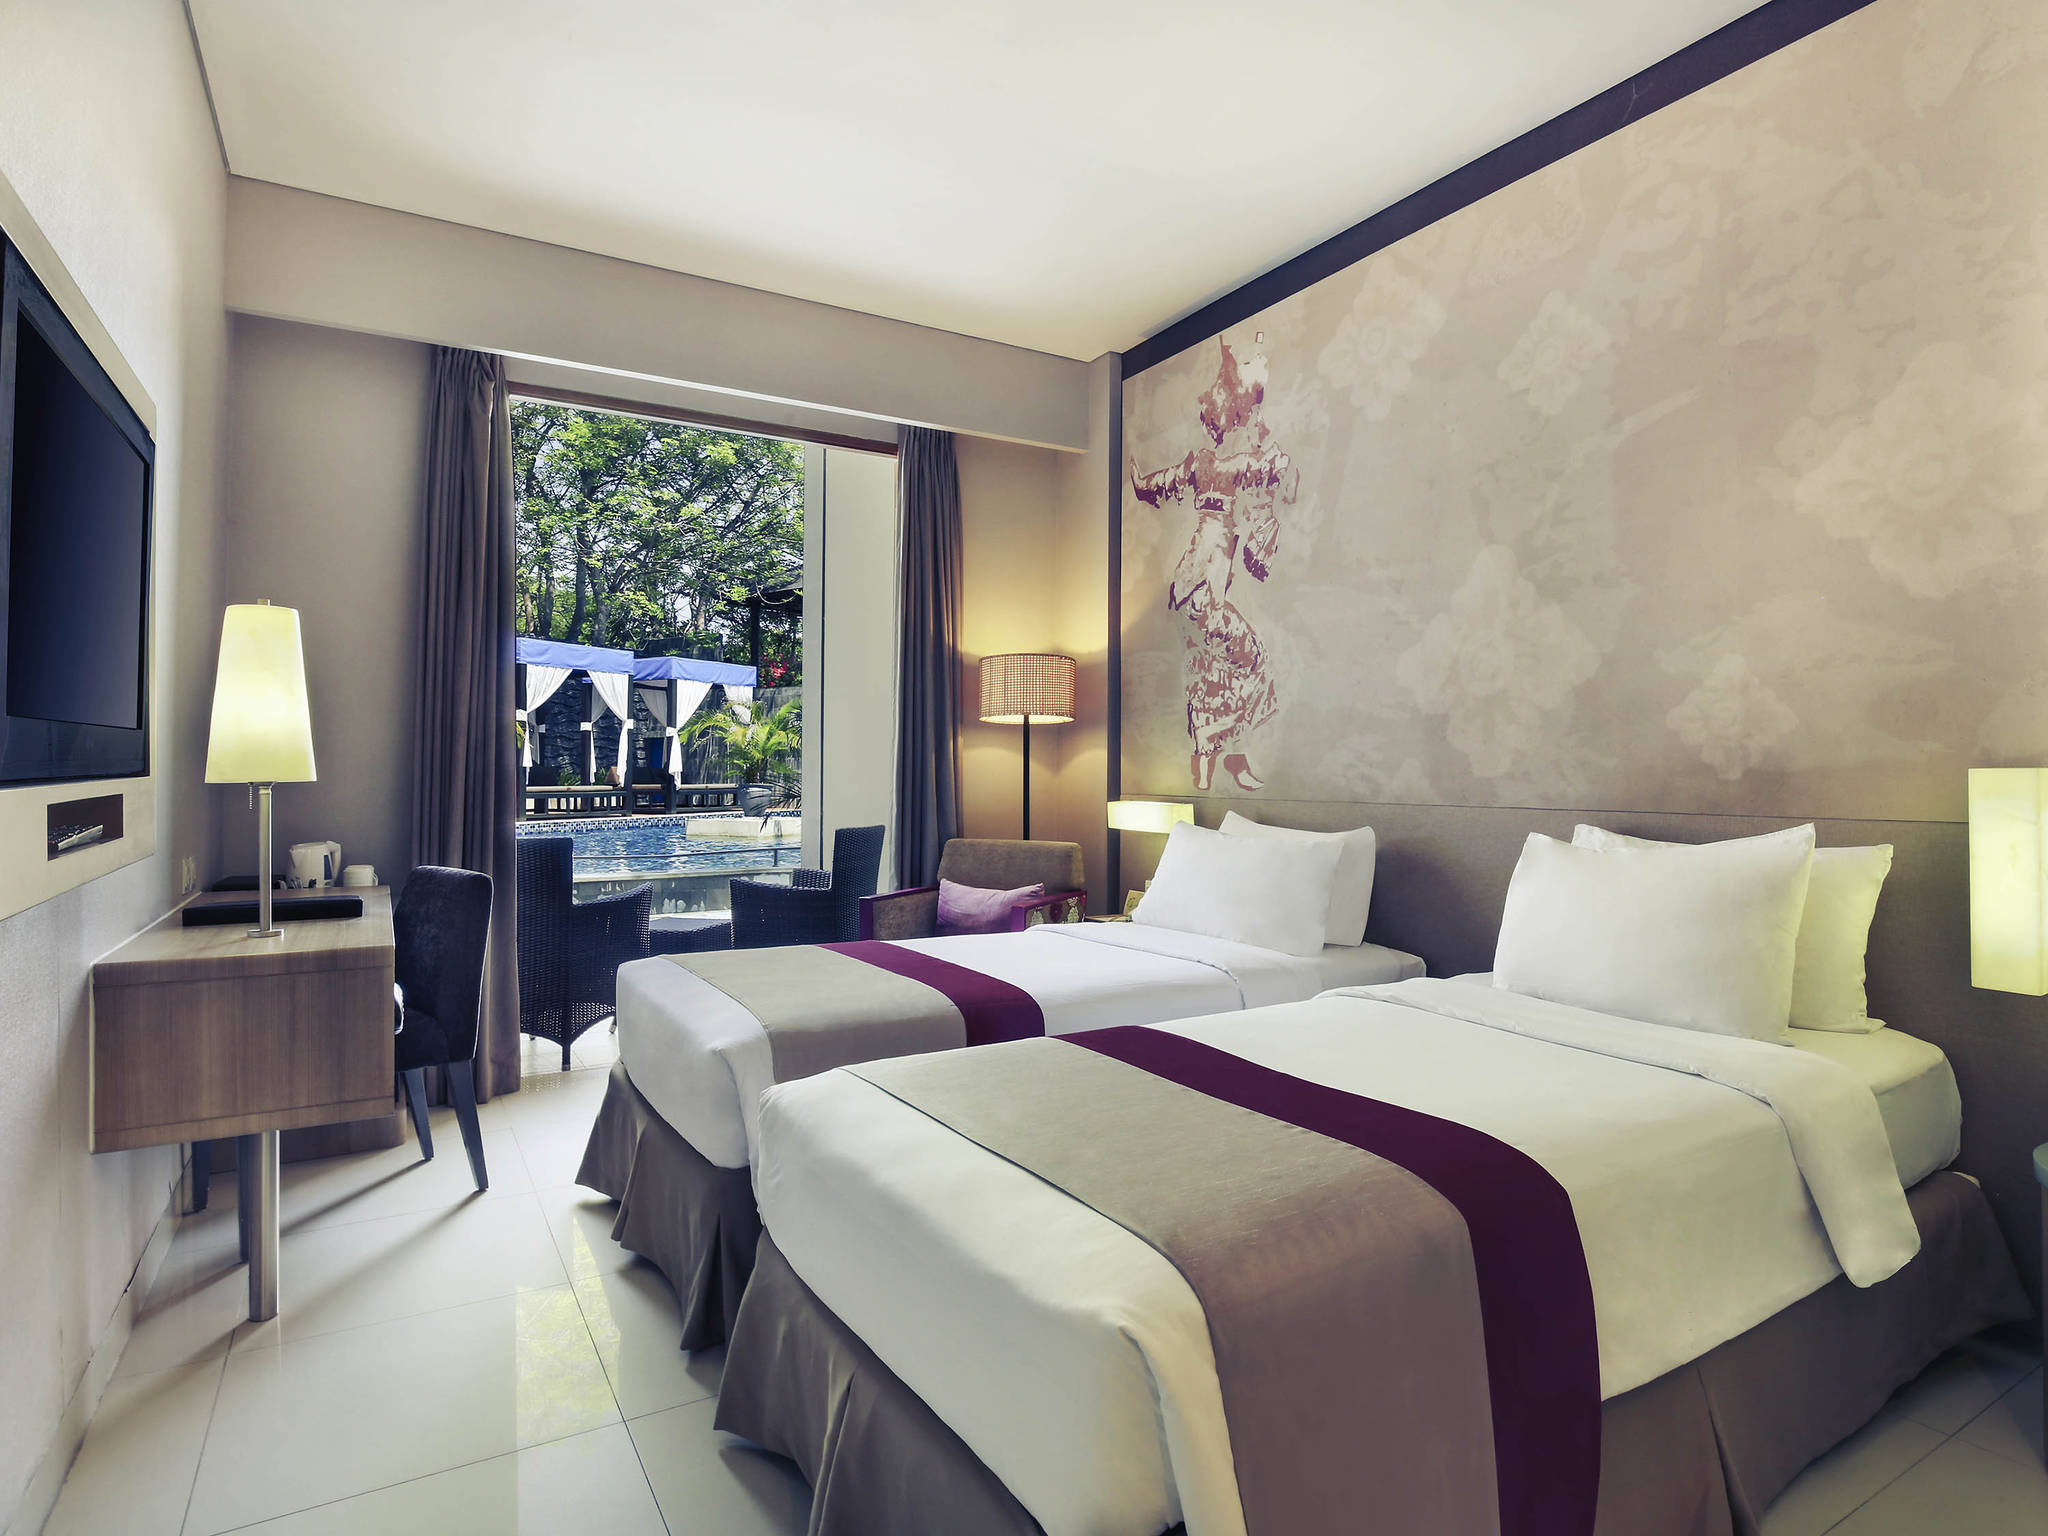 Mercure Bali Nusa Dua Business Leisure Accorhotels Voucher Hotel Ayodya Resort Deluxe Bed An Breakfast Rooms